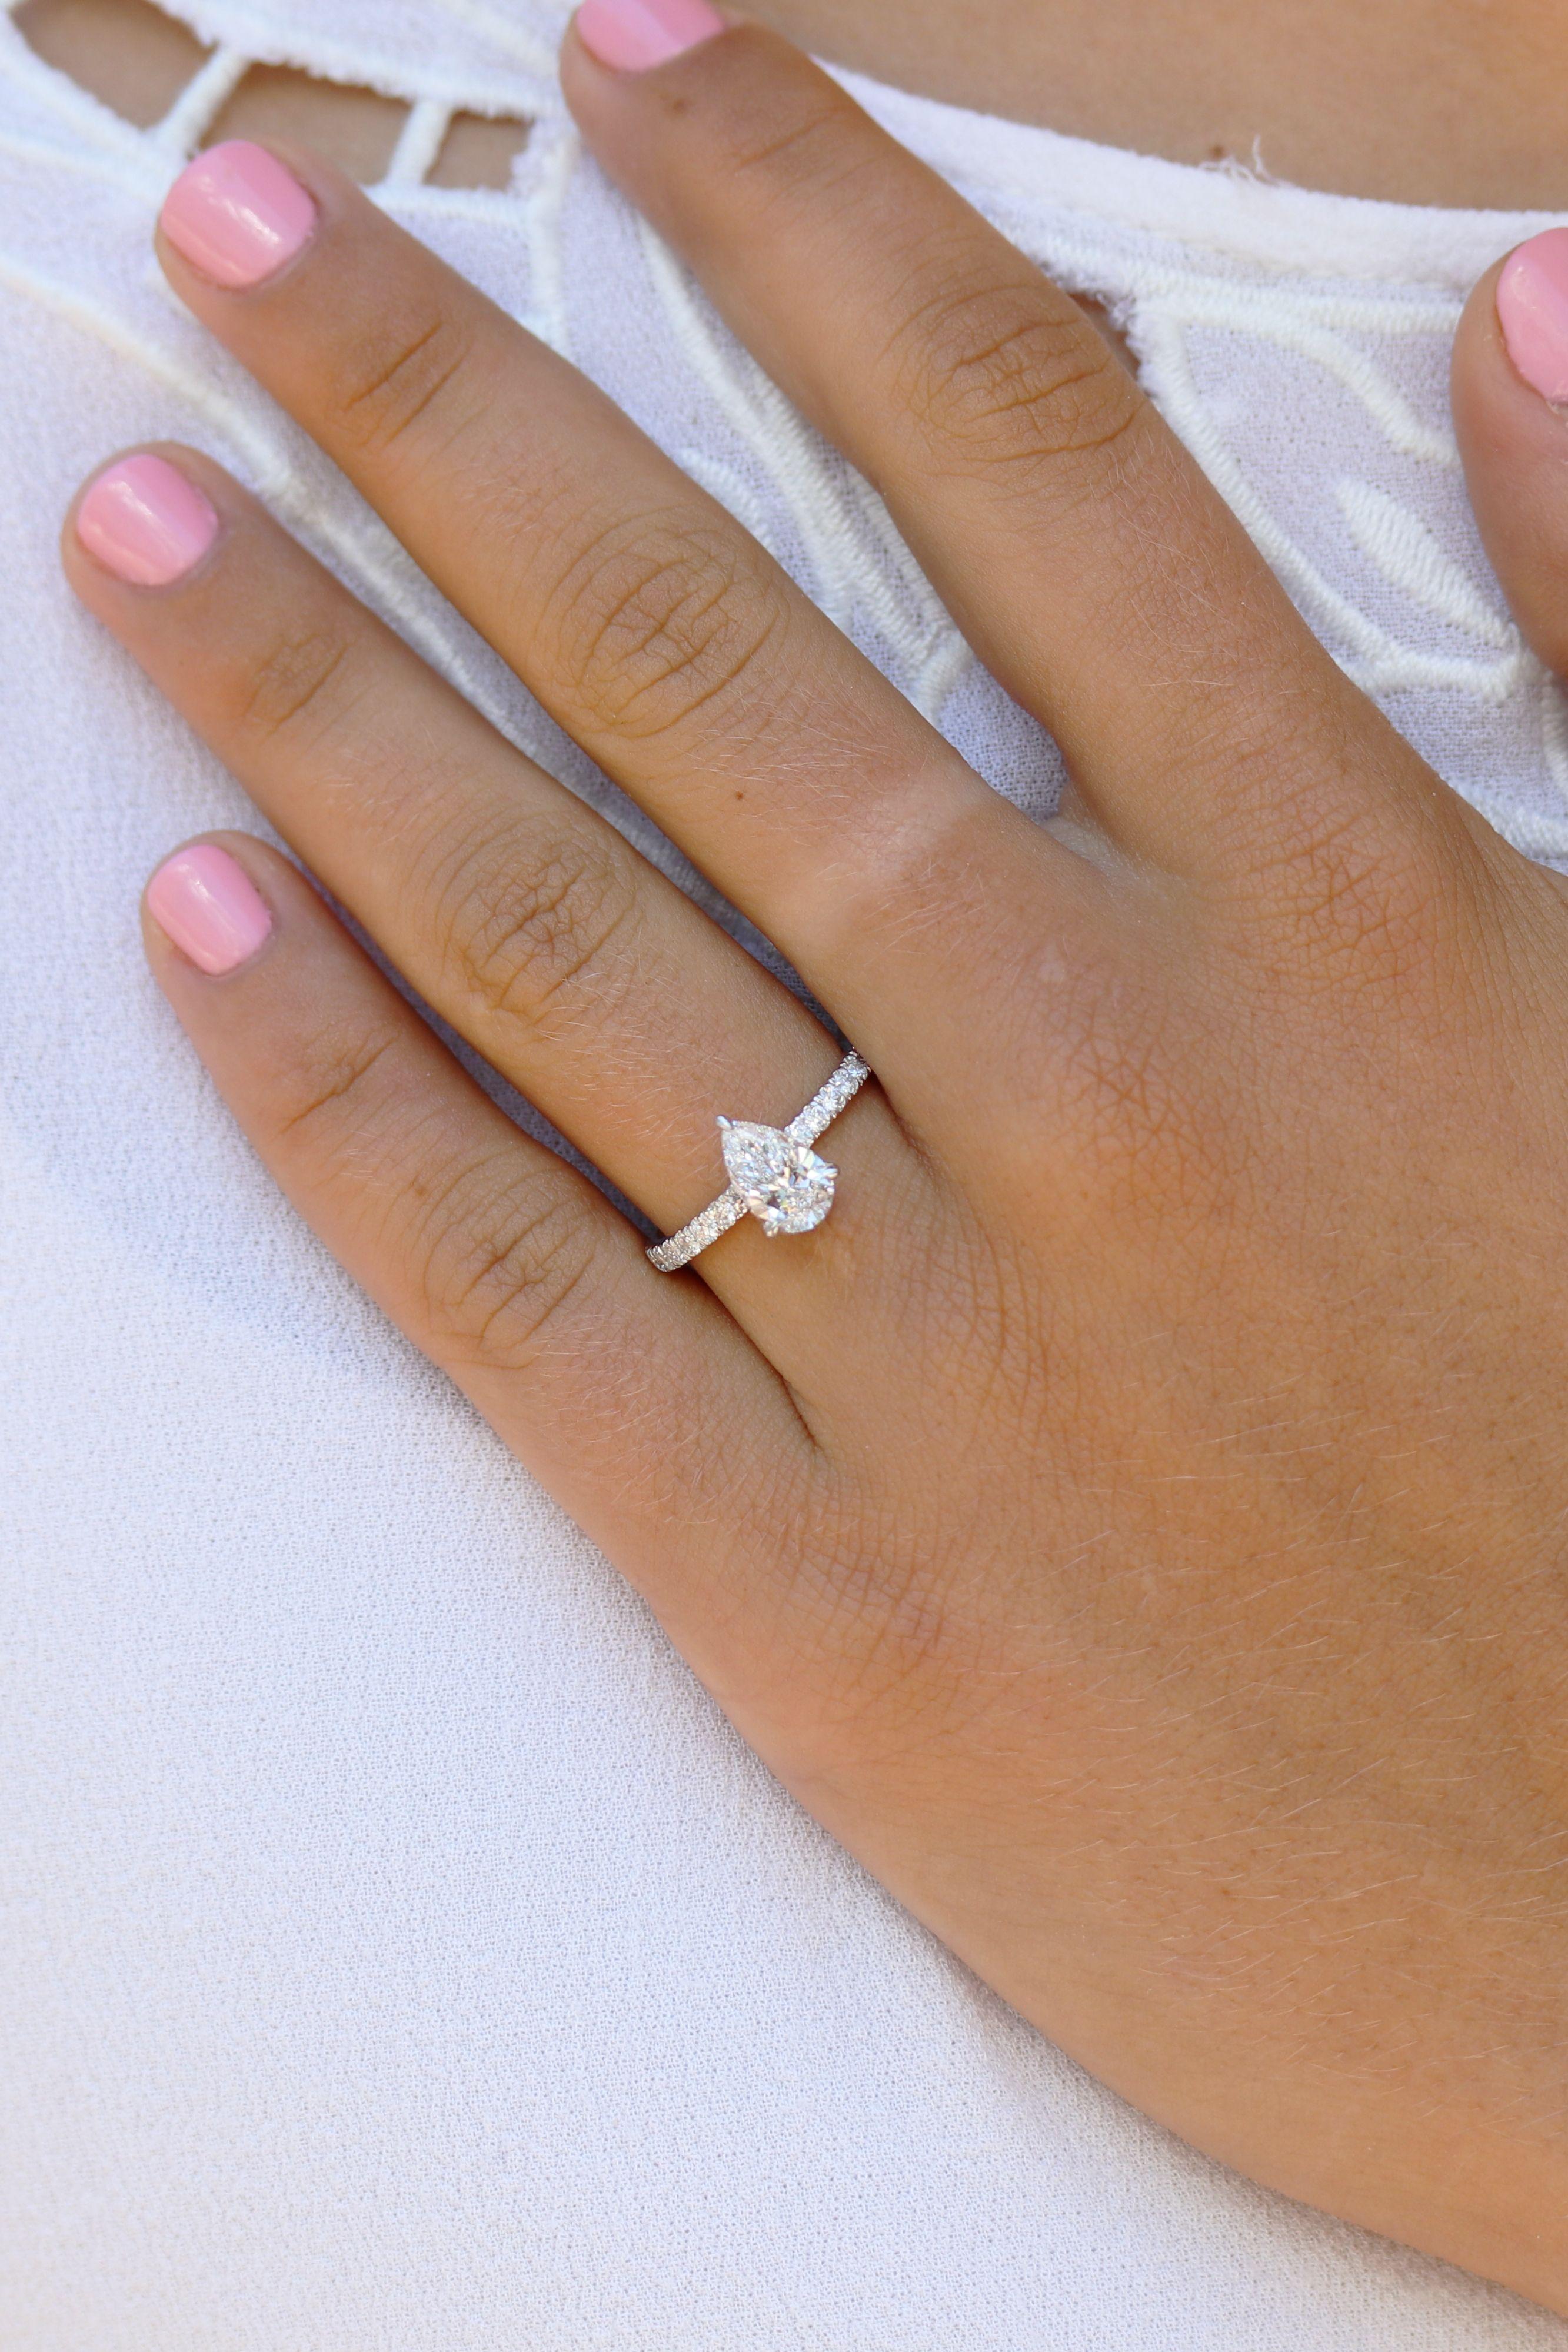 Diamond Band Pear Shaped Lab Diamond Engagement Ring Bring Your Vision To Lif Diamond Band Engagement Ring Lab Diamond Engagement Ring Diamond Engagement Band